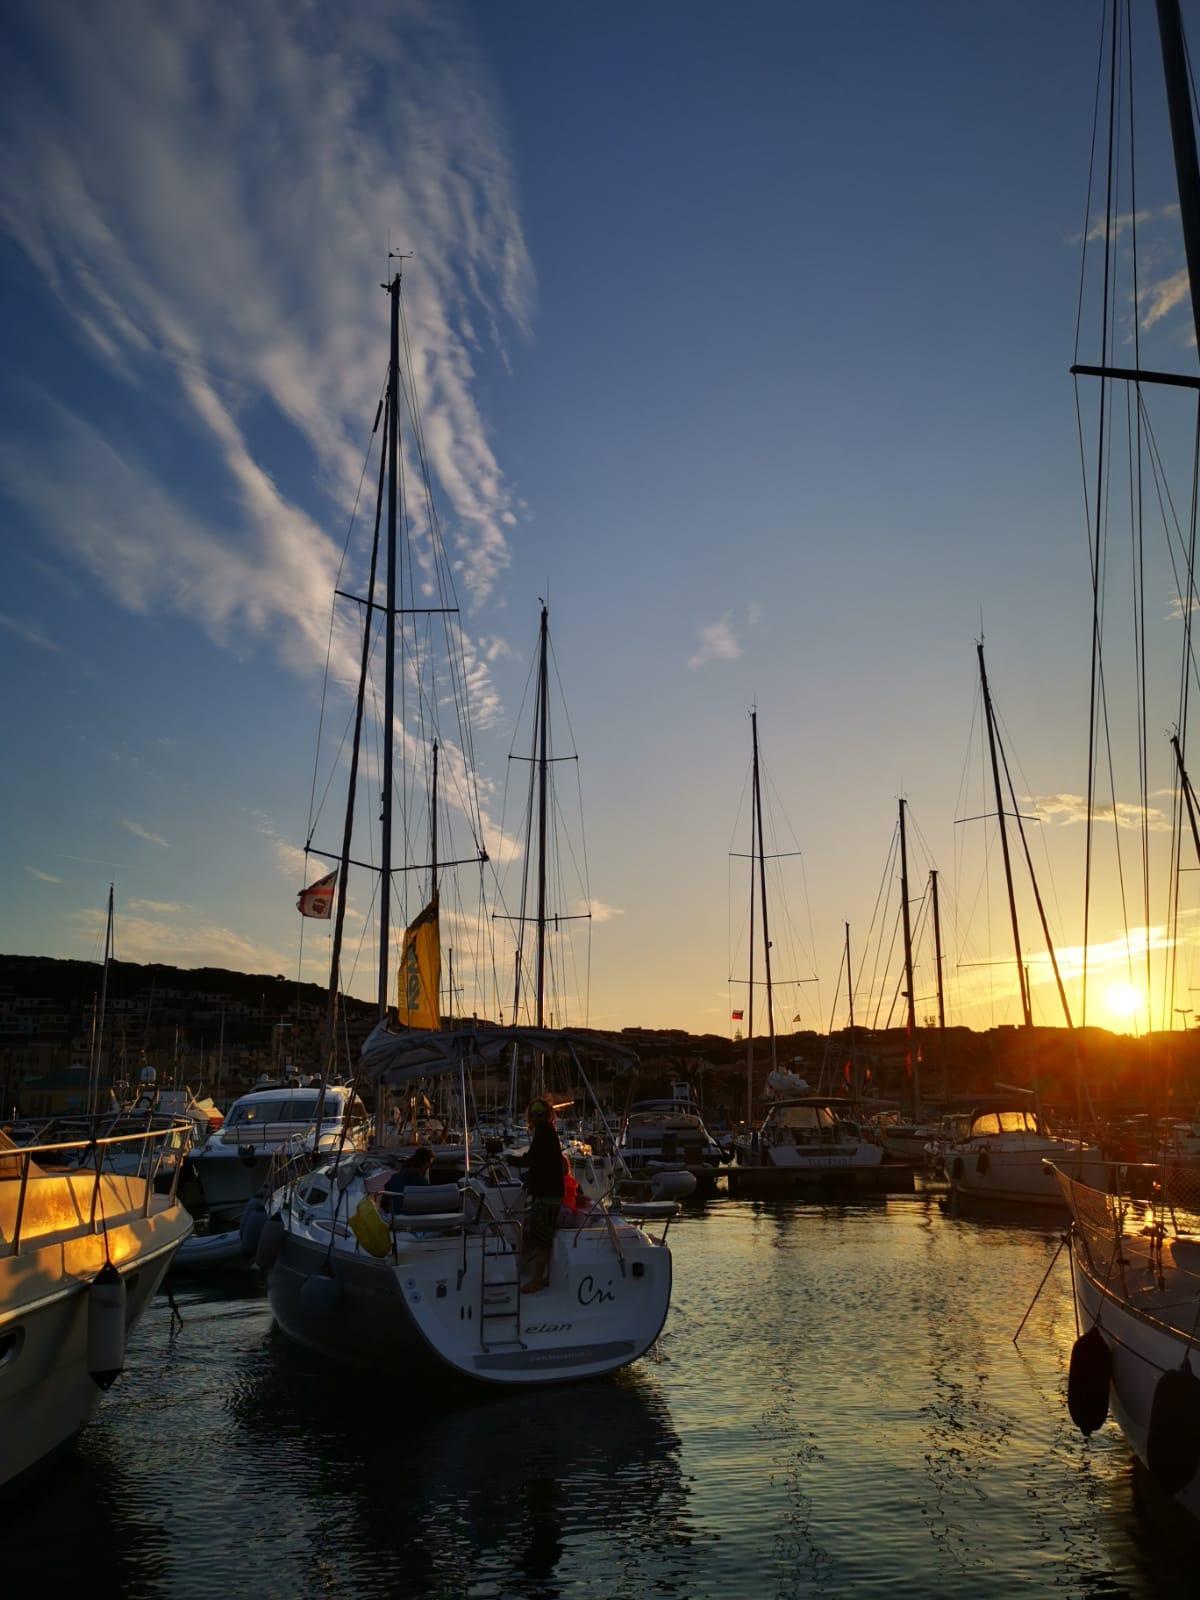 tramonto in barca a vela sardegna palau